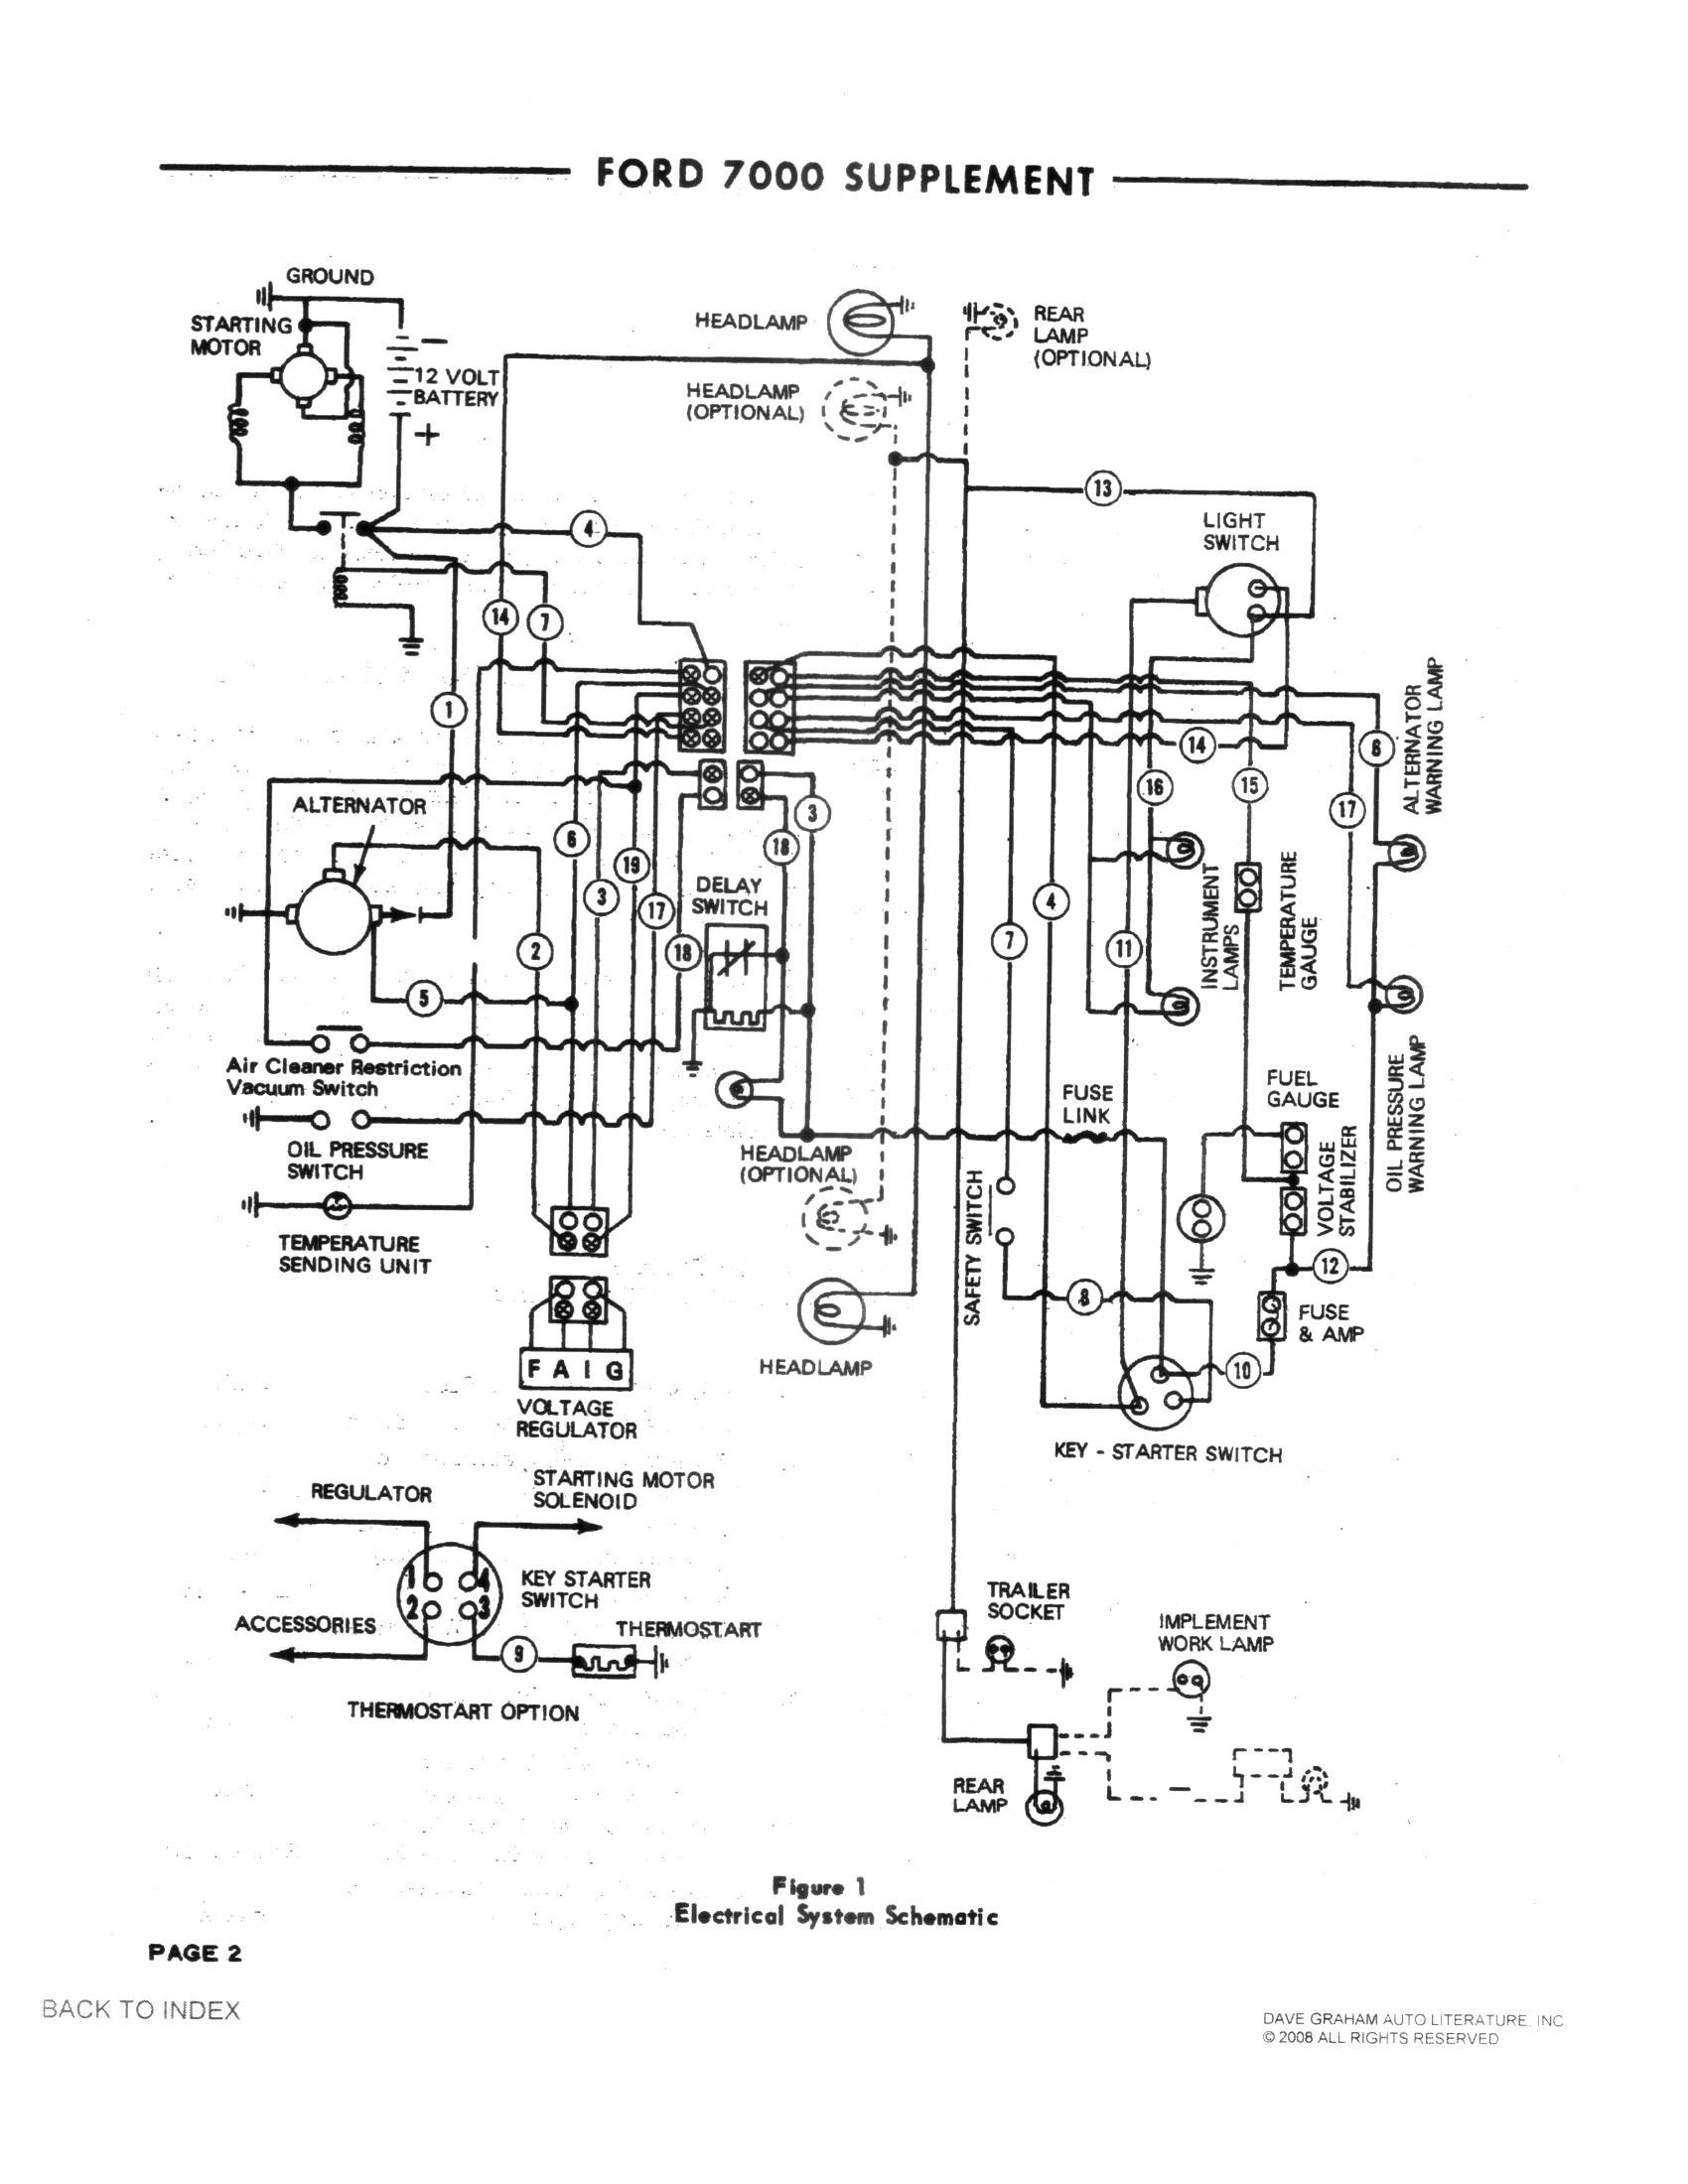 hight resolution of motorola alternator wiring diagram john deere wiring diagram hostunique motorola alternator wiring diagram john deere diagrams